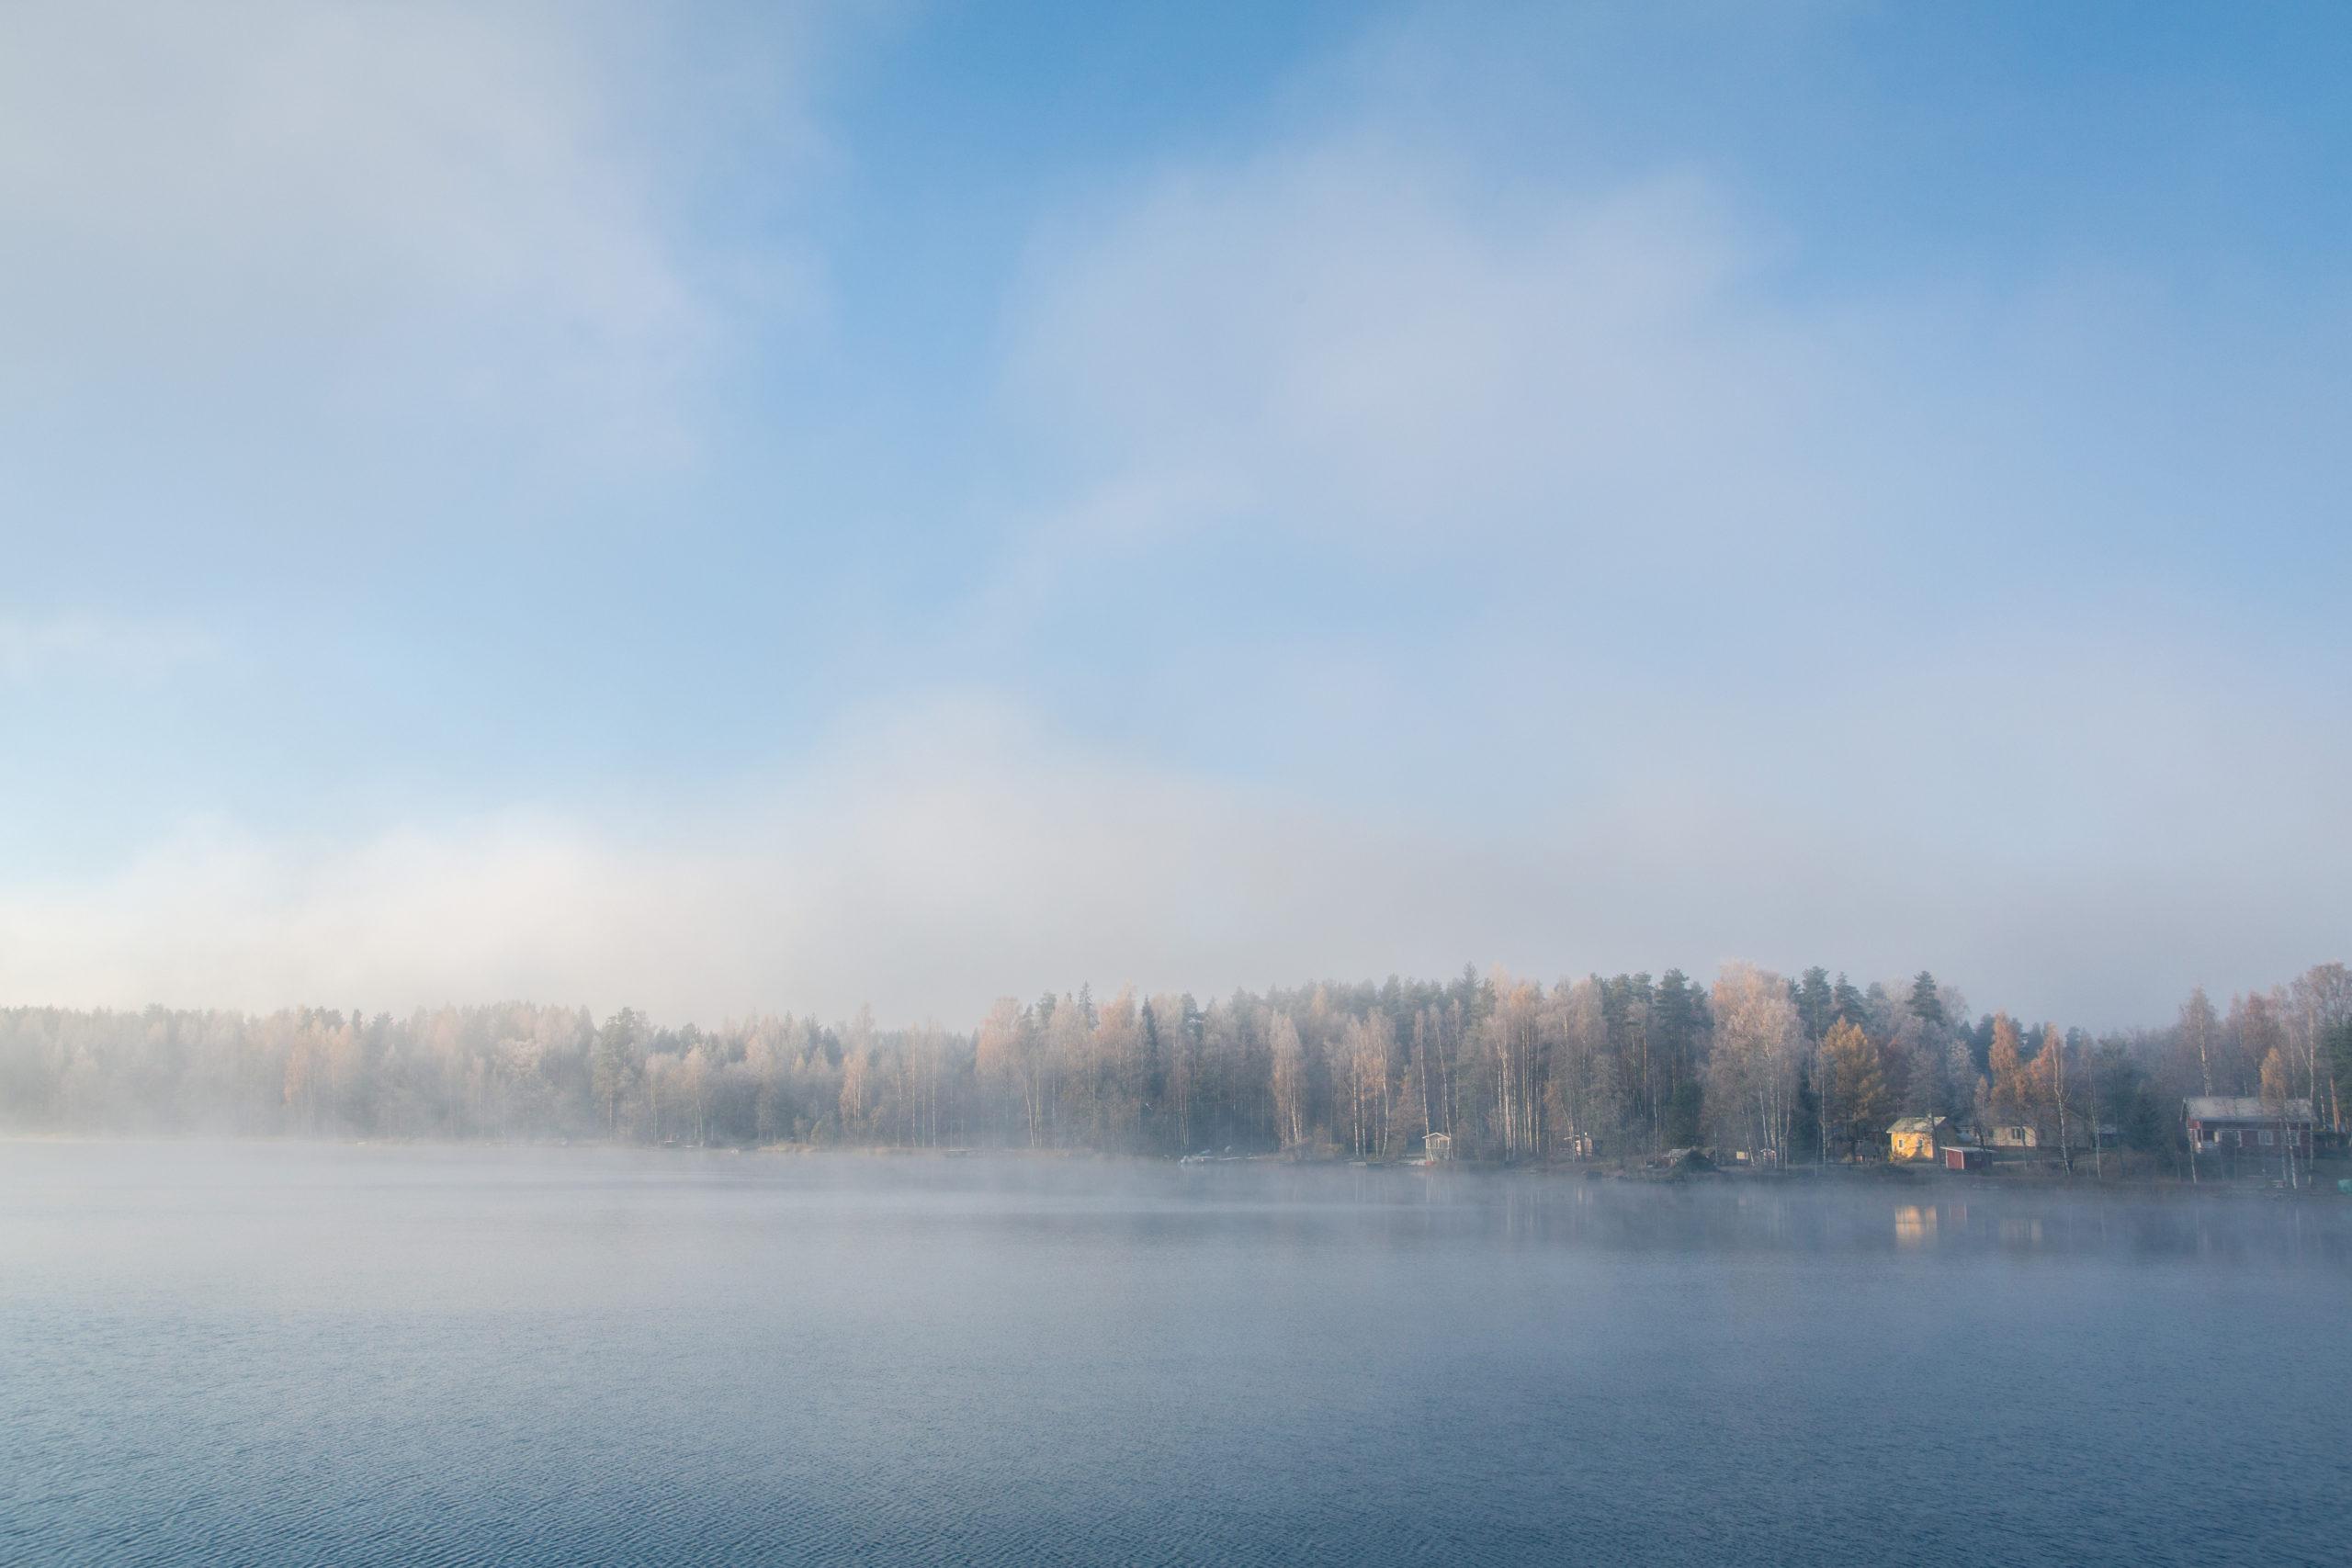 Järvi aamu-usvan peitossa